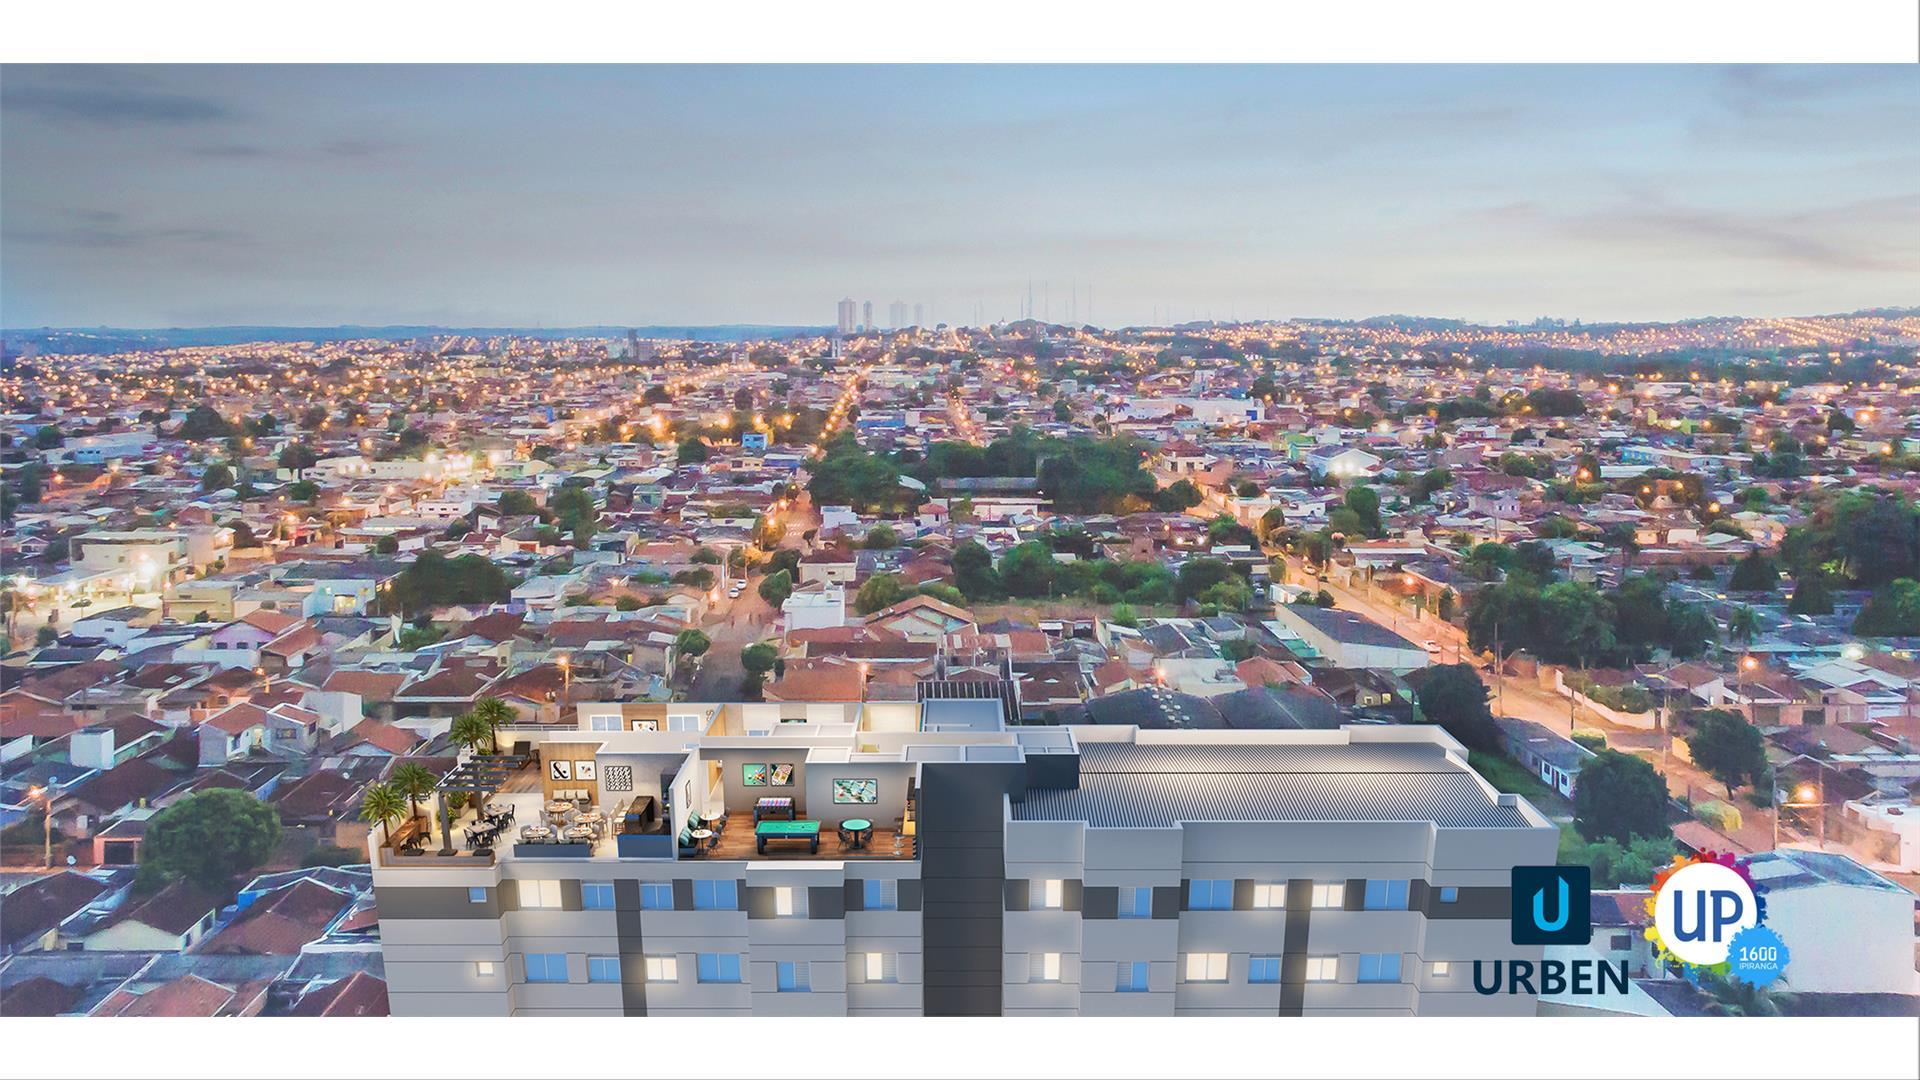 Vista Aérea do Rooftop.jpg